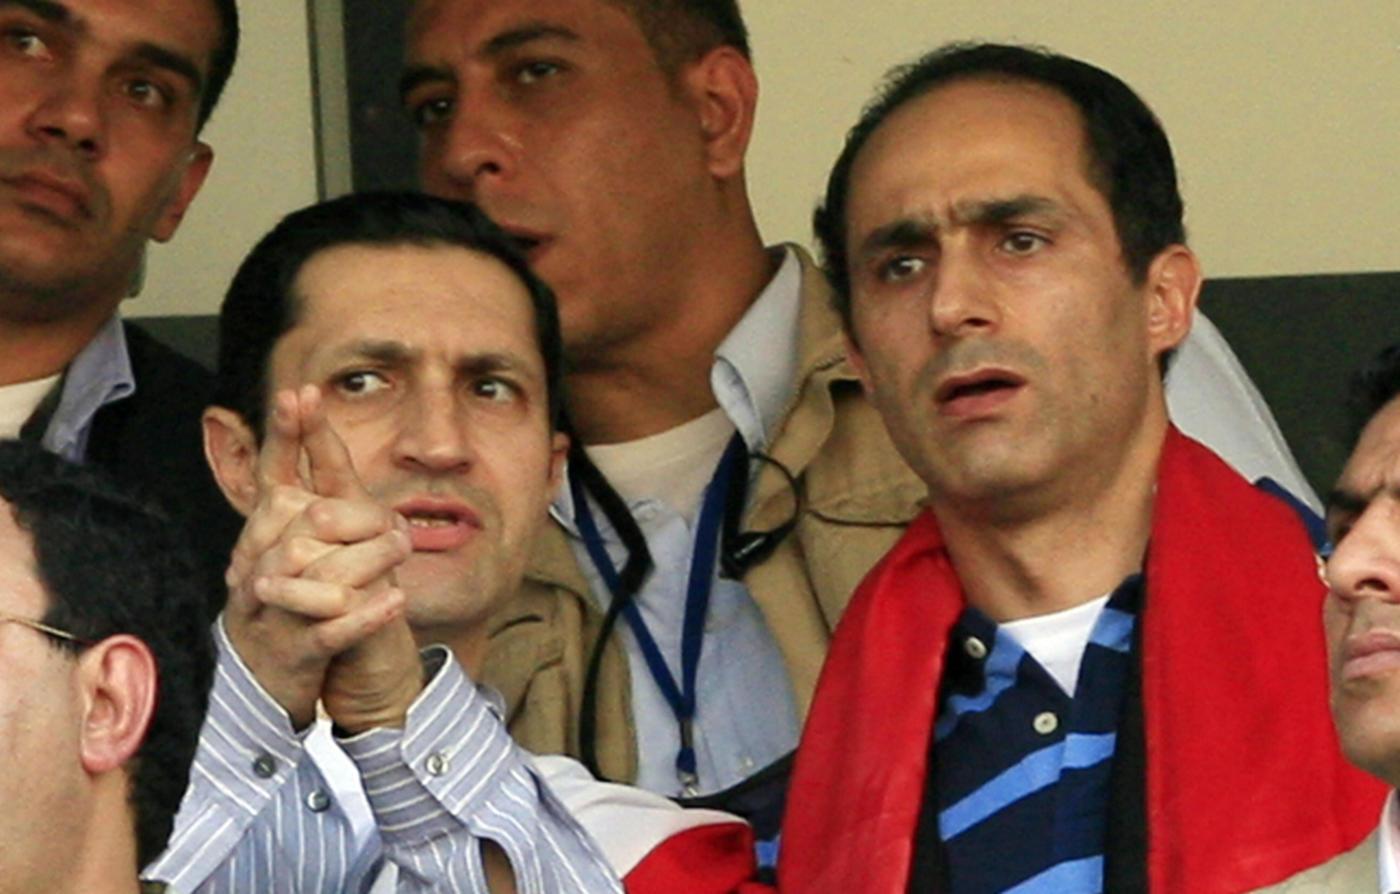 egypt court orders arrest of mubarak s sons over stock market